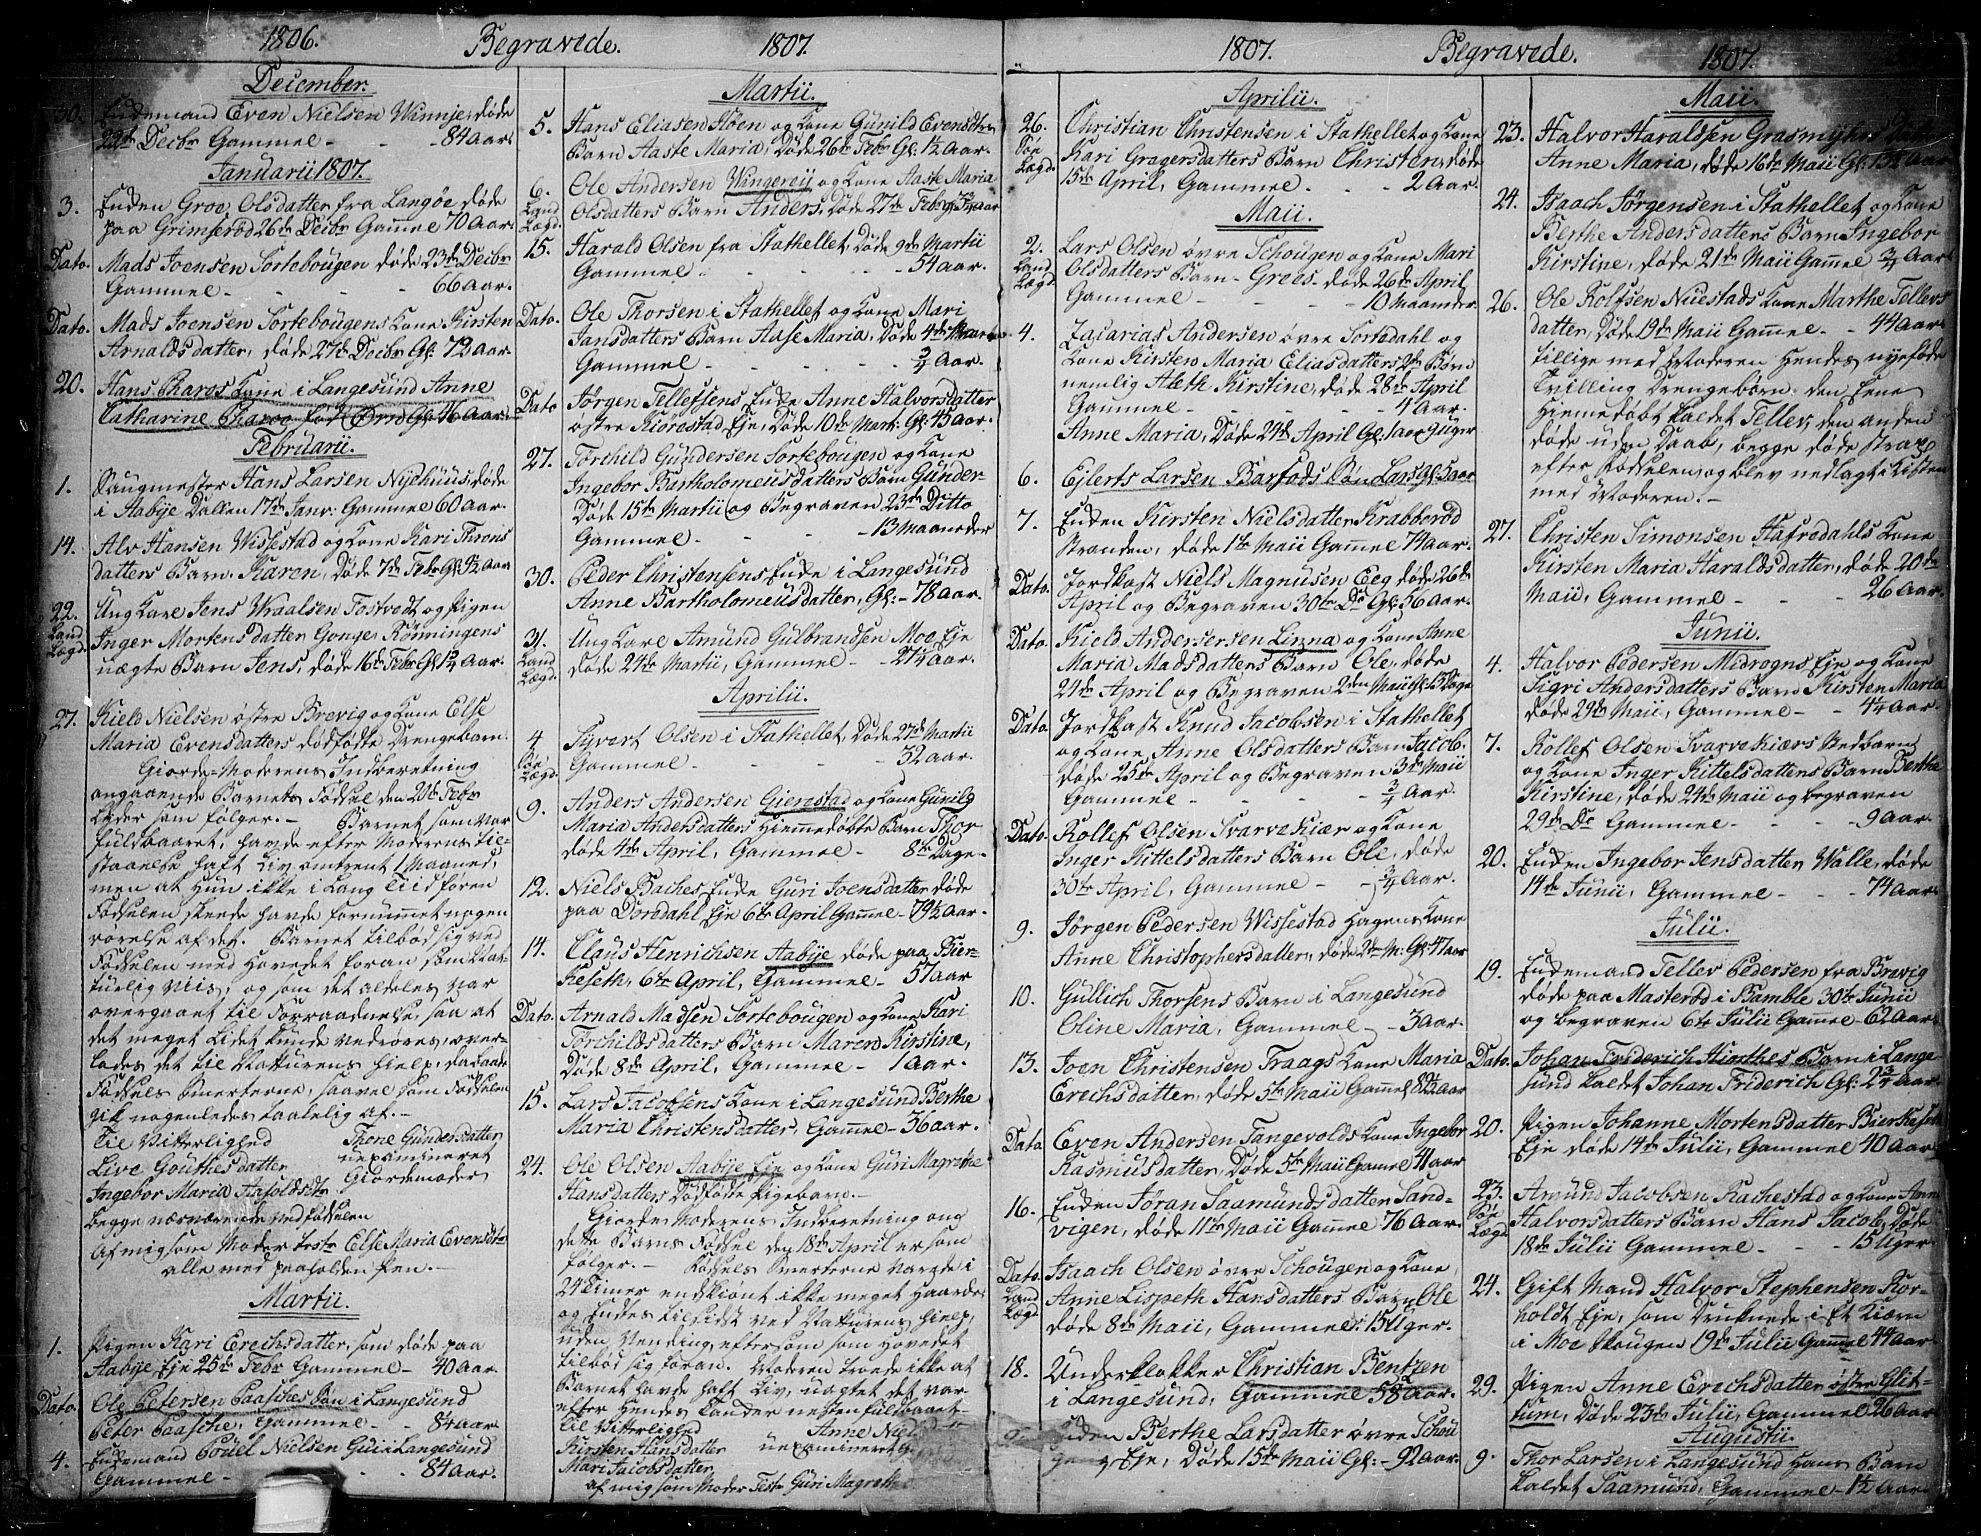 SAKO, Bamble kirkebøker, F/Fa/L0002: Ministerialbok nr. I 2, 1775-1814, s. 556-557